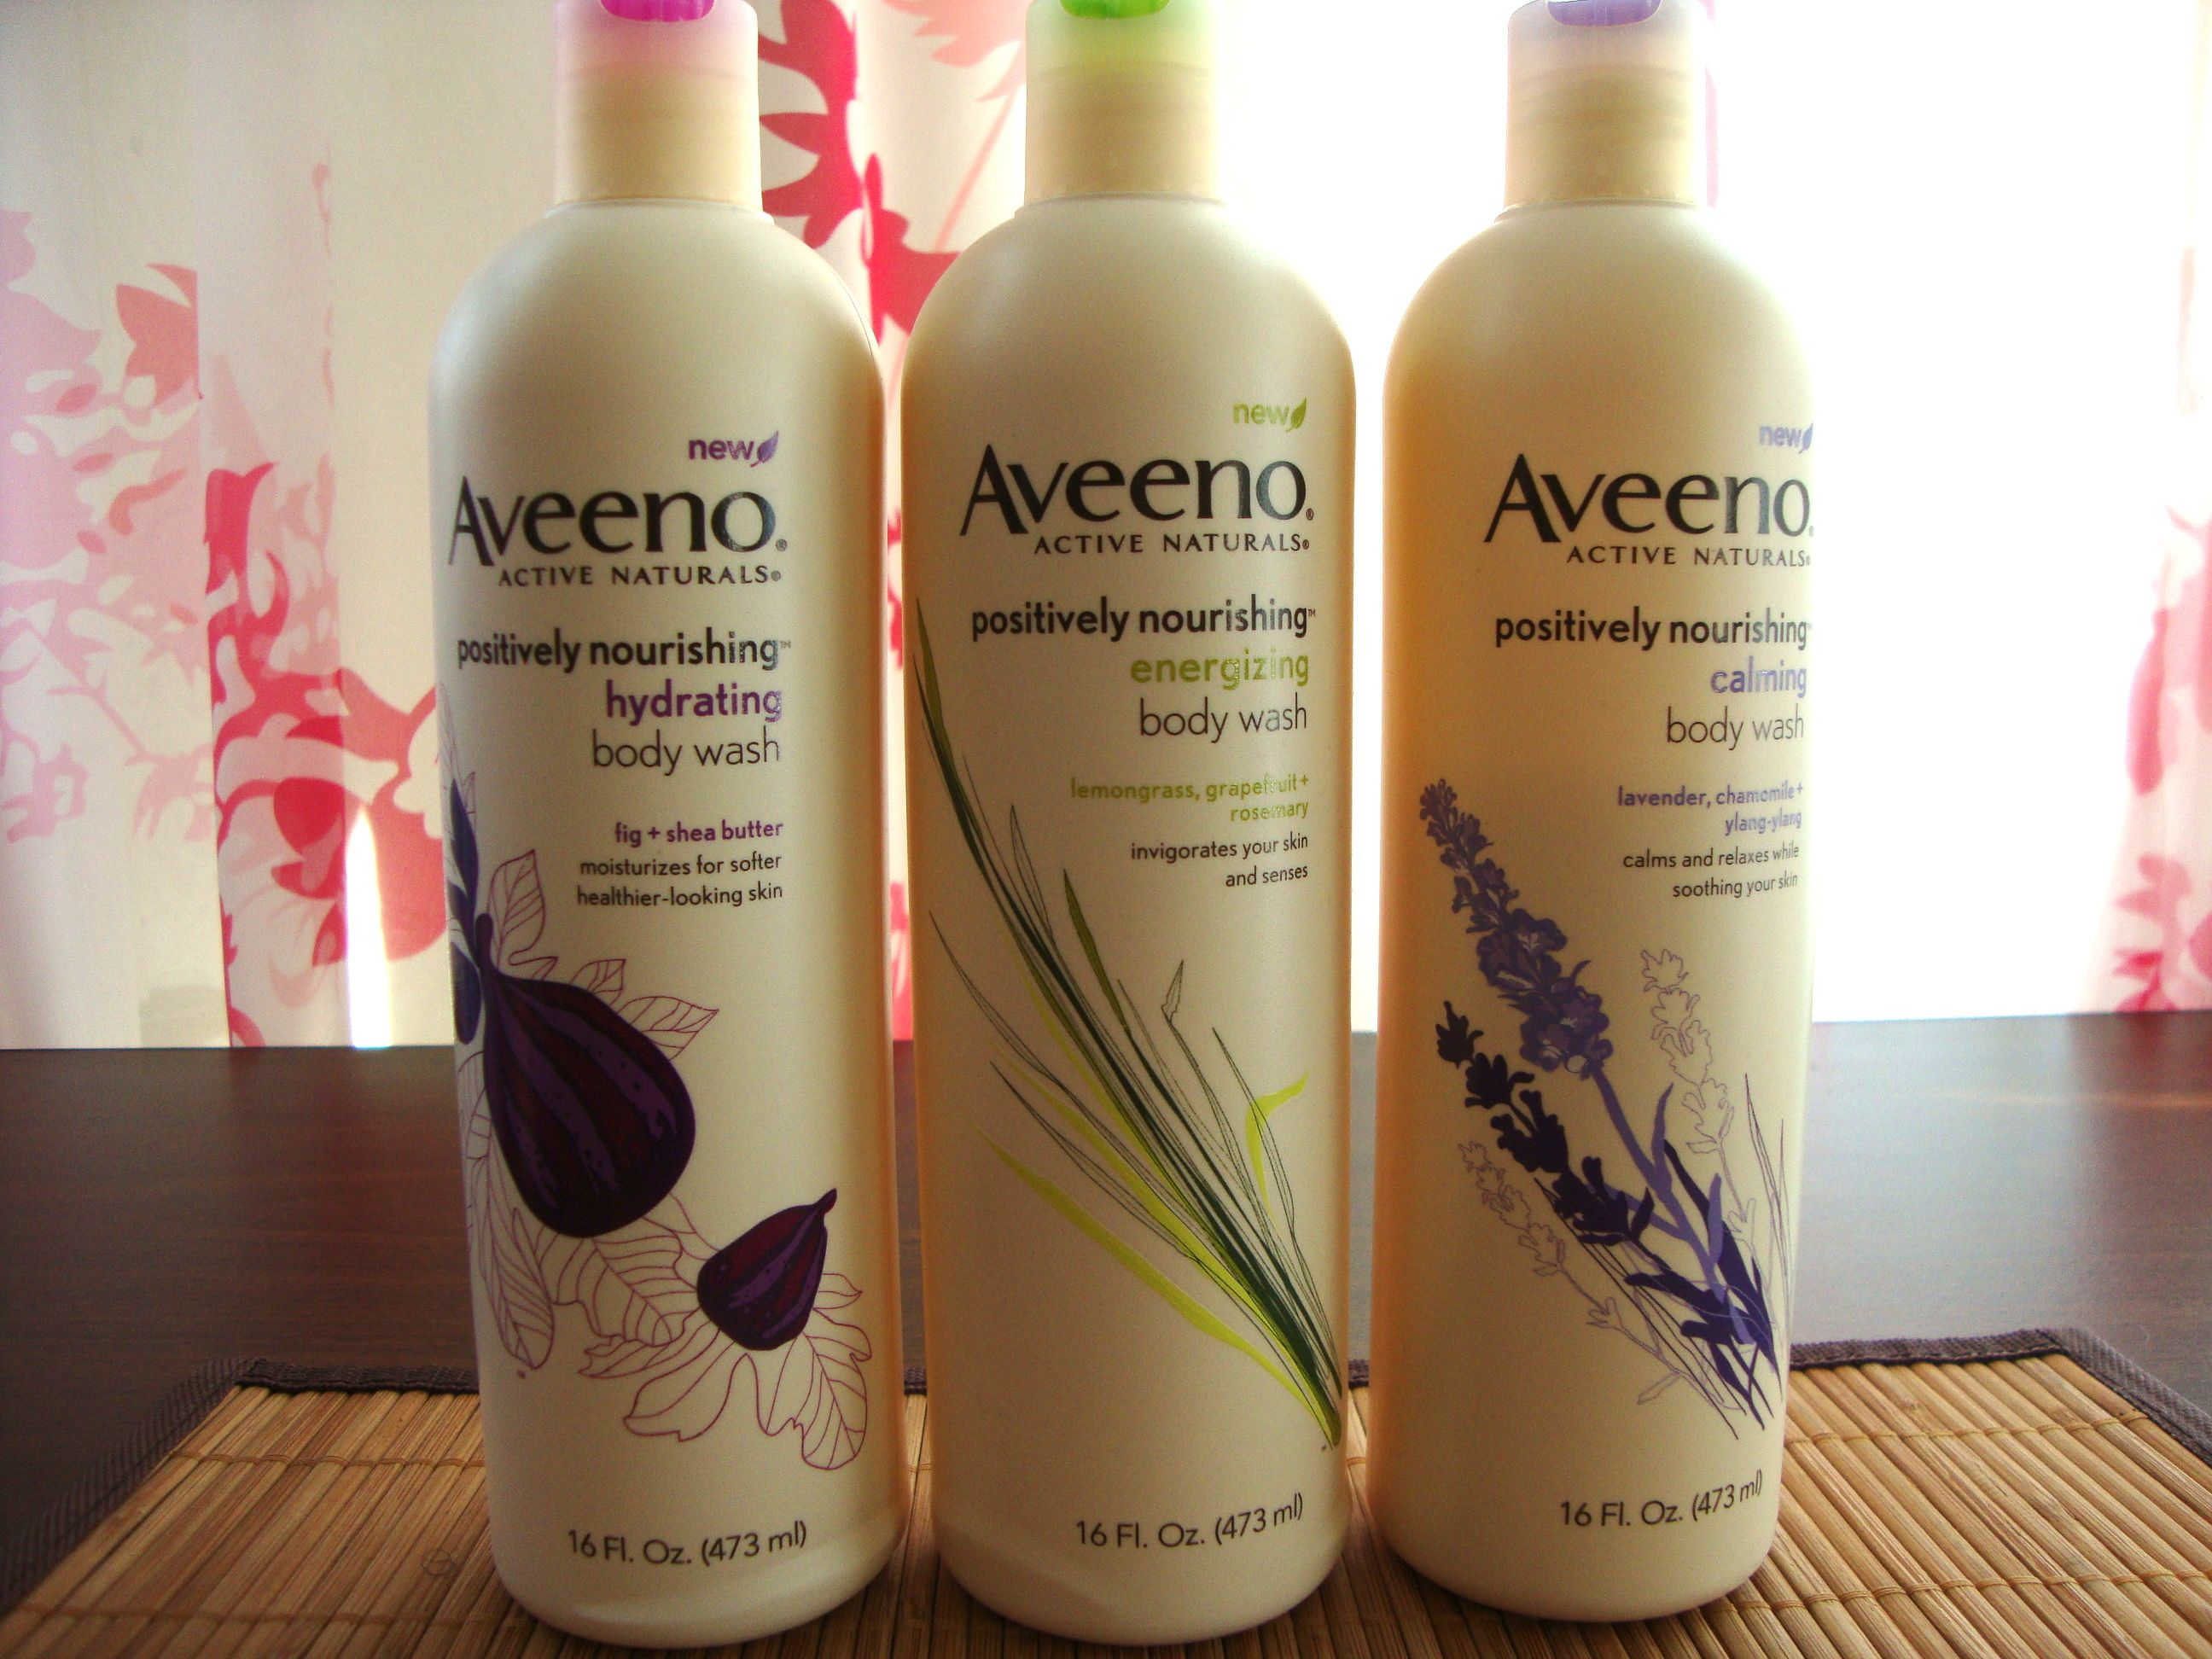 Dsc02648 Aveeno Body Wash Body Wash Aveeno Active Naturals